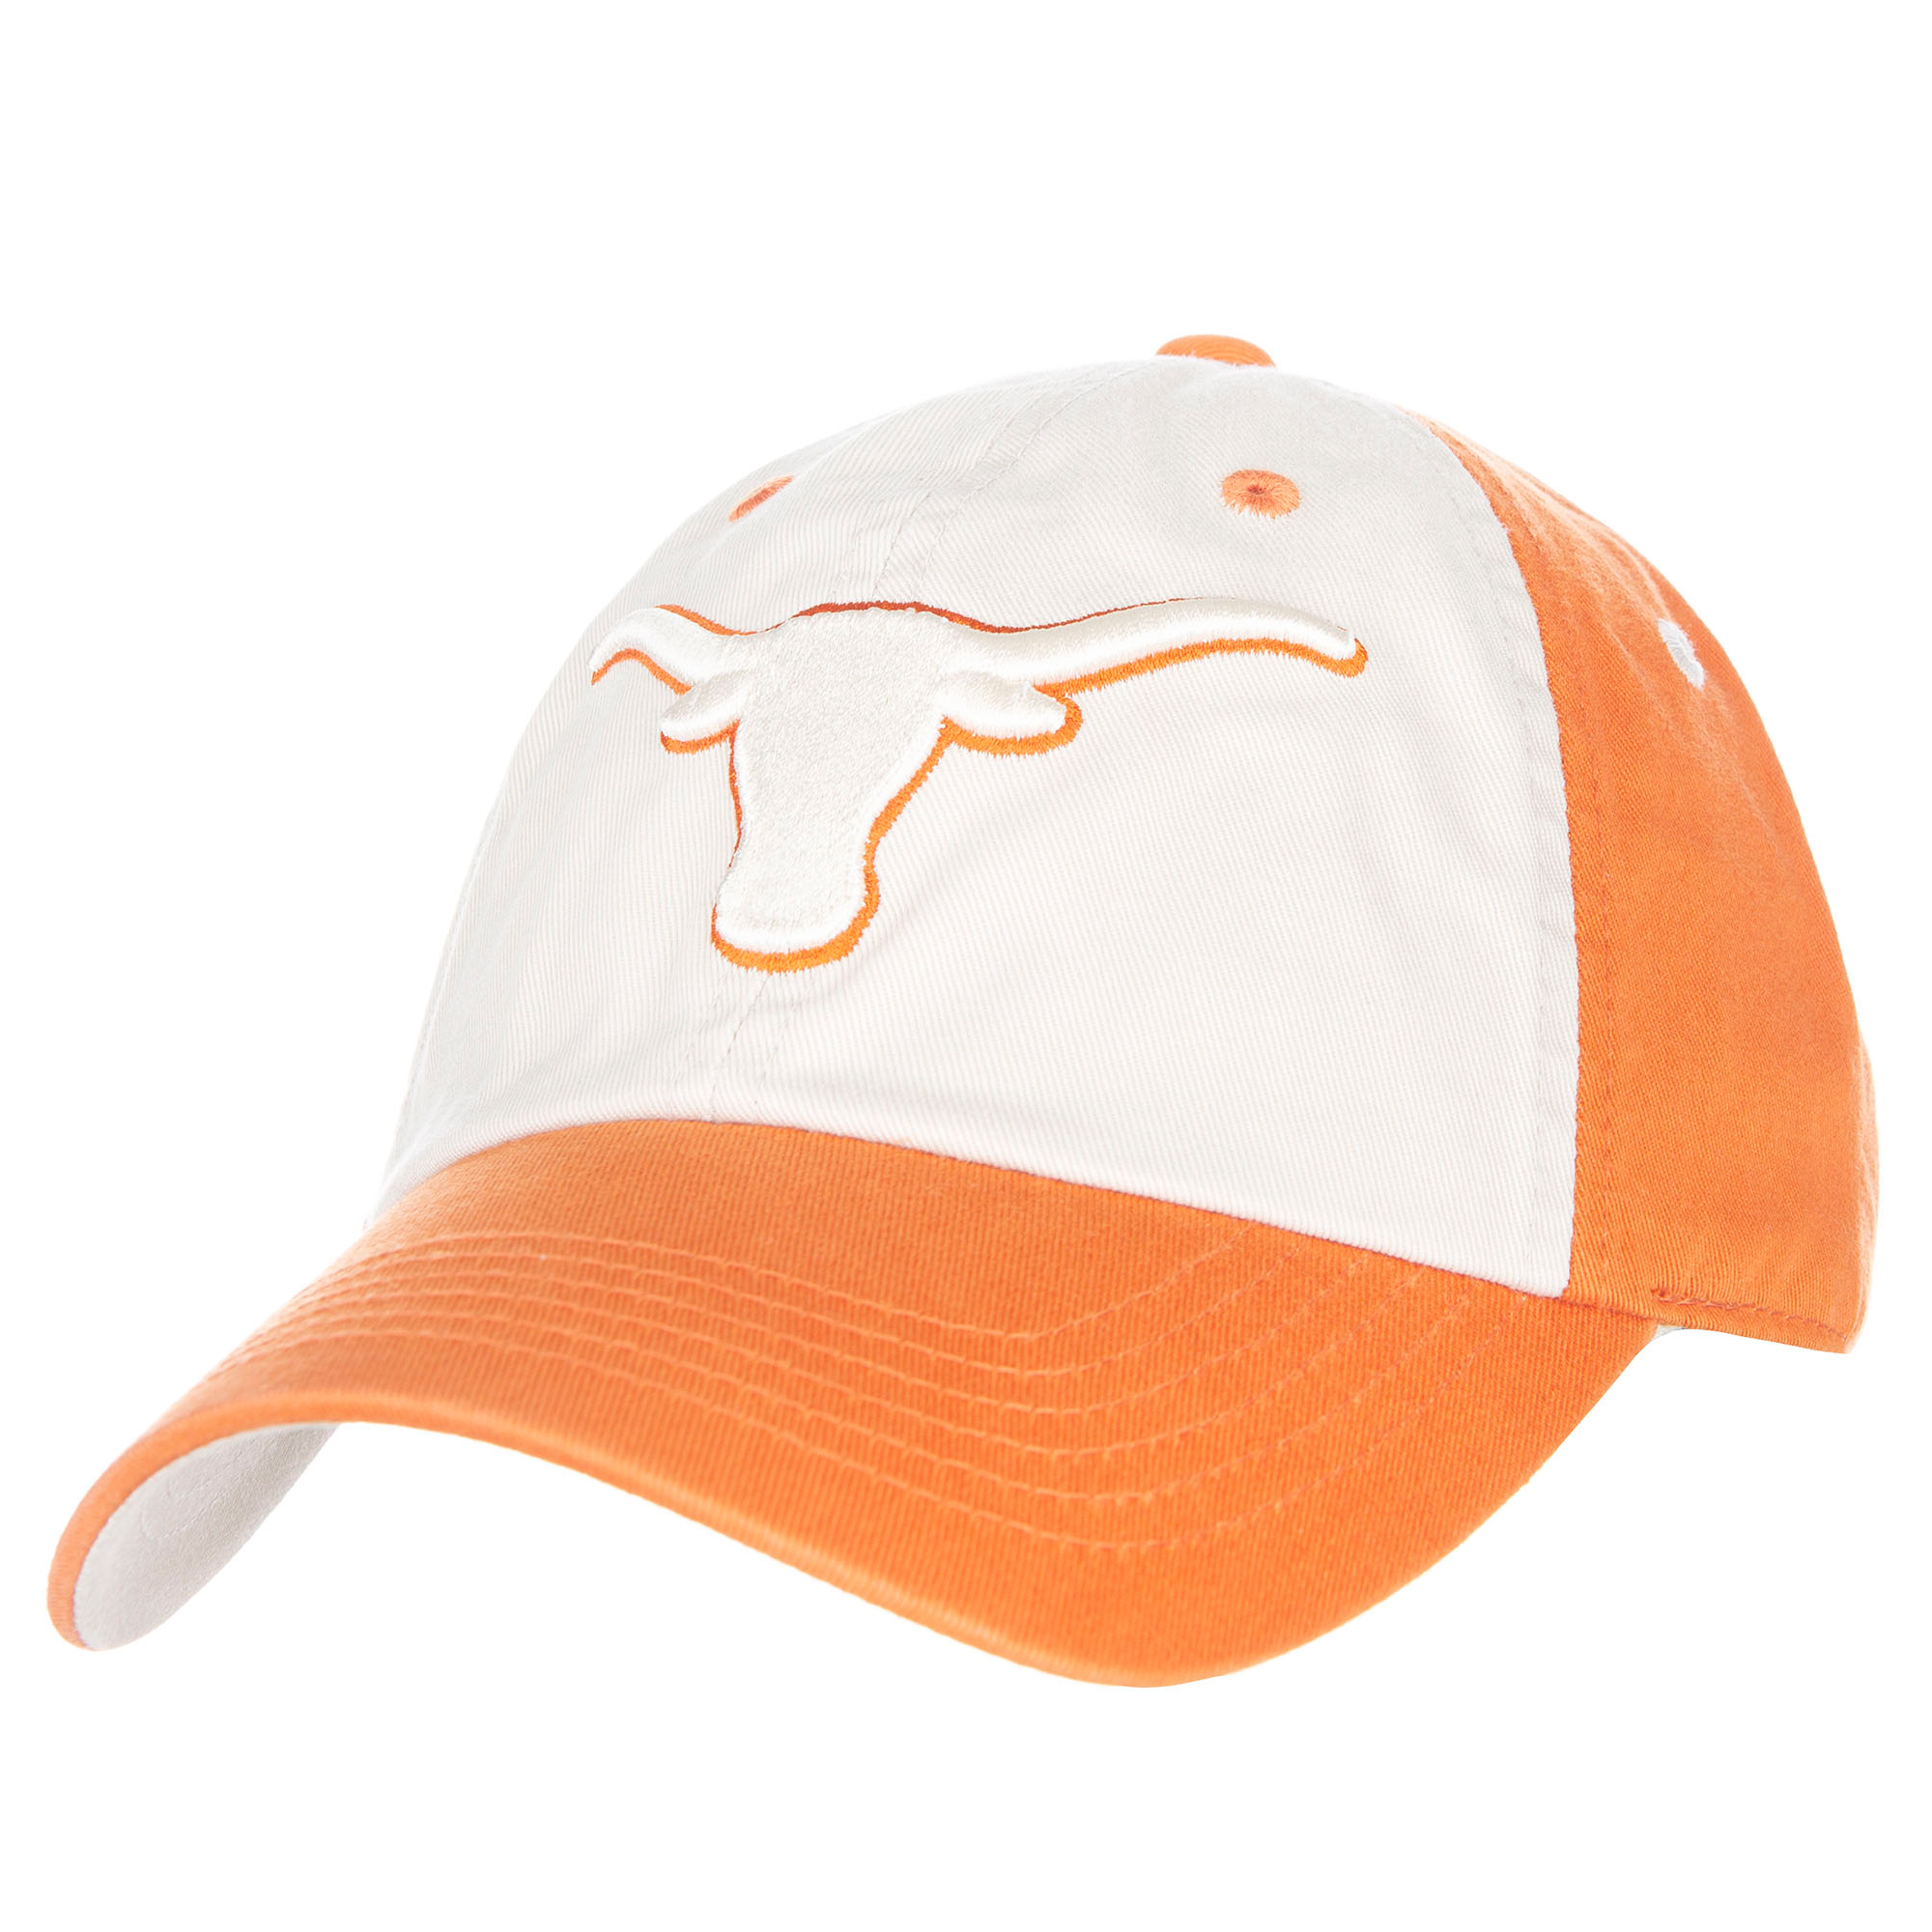 hot sale online c4d9e e58c3 Men s Tan Texas Orange Texas Longhorns Goulburn Adjustable Hat - OSFA -  Walmart.com